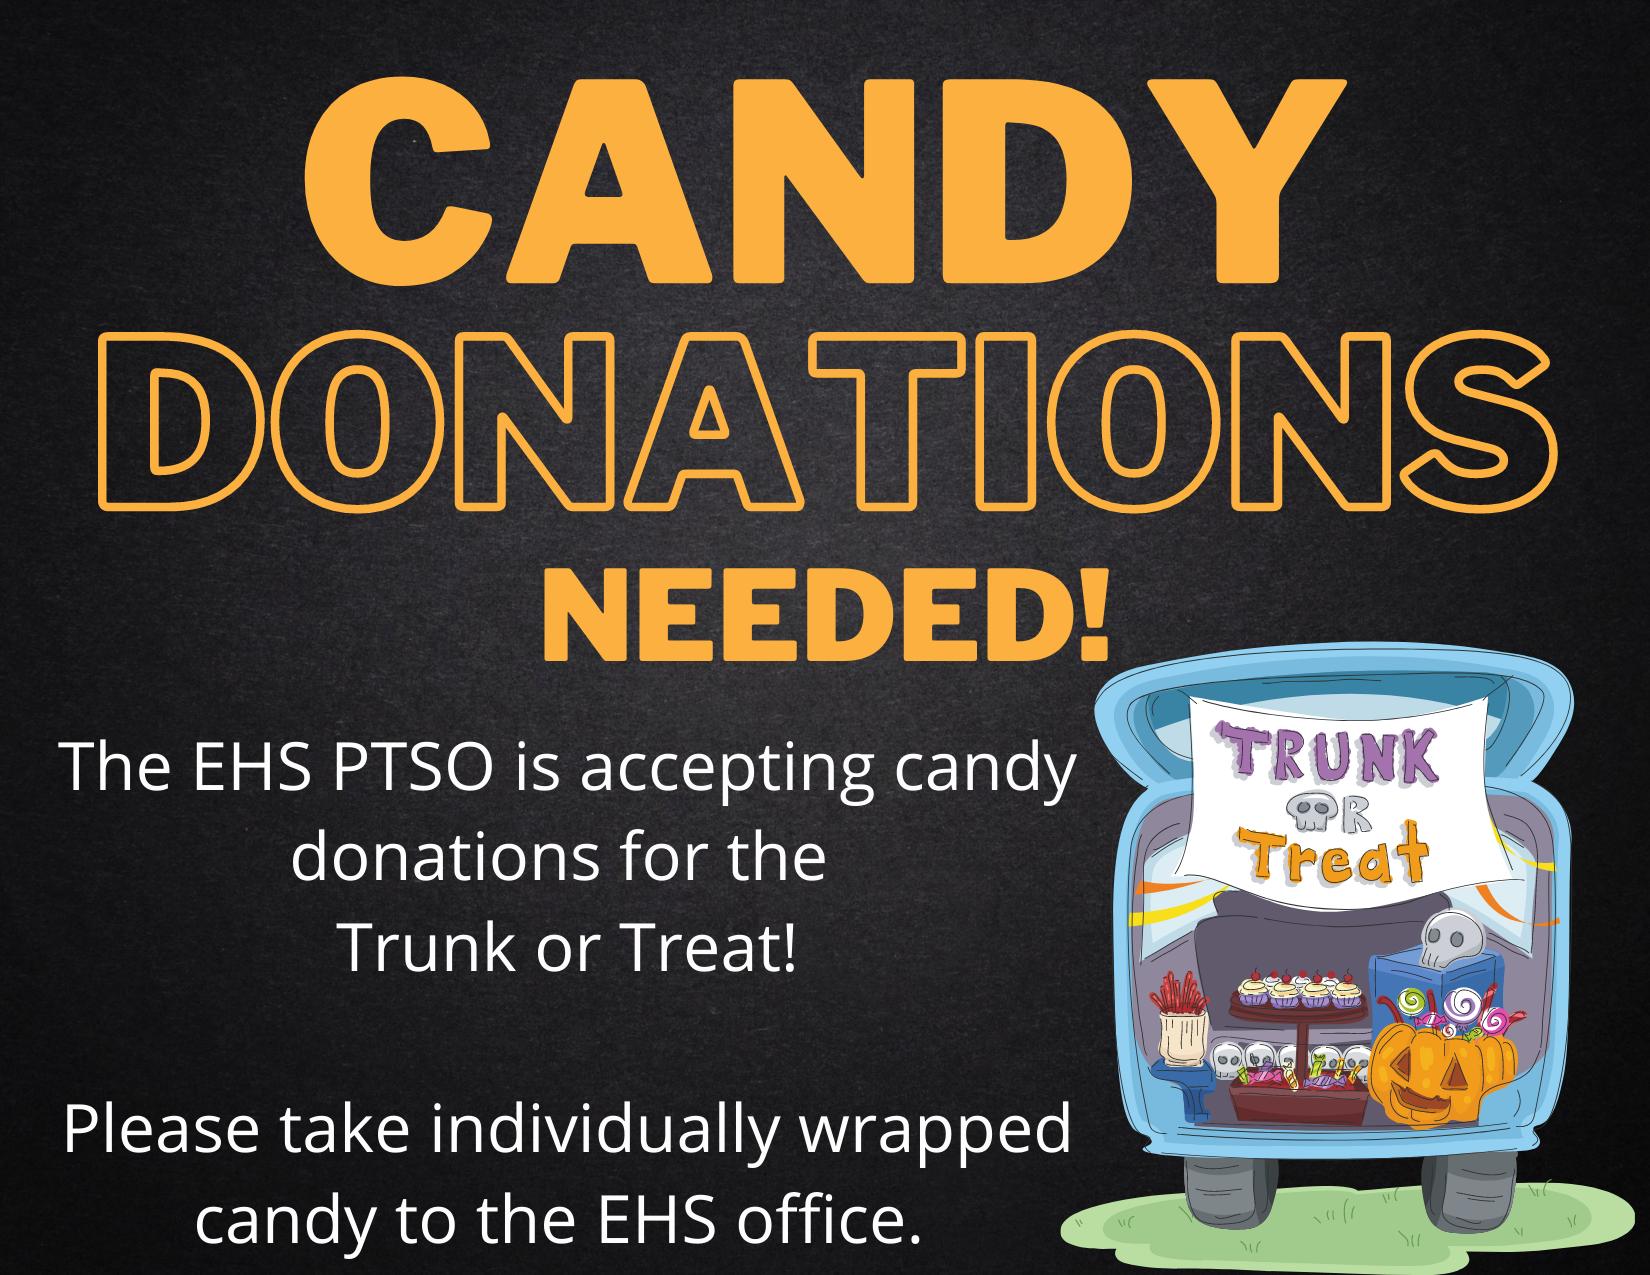 Your Help is Needed!